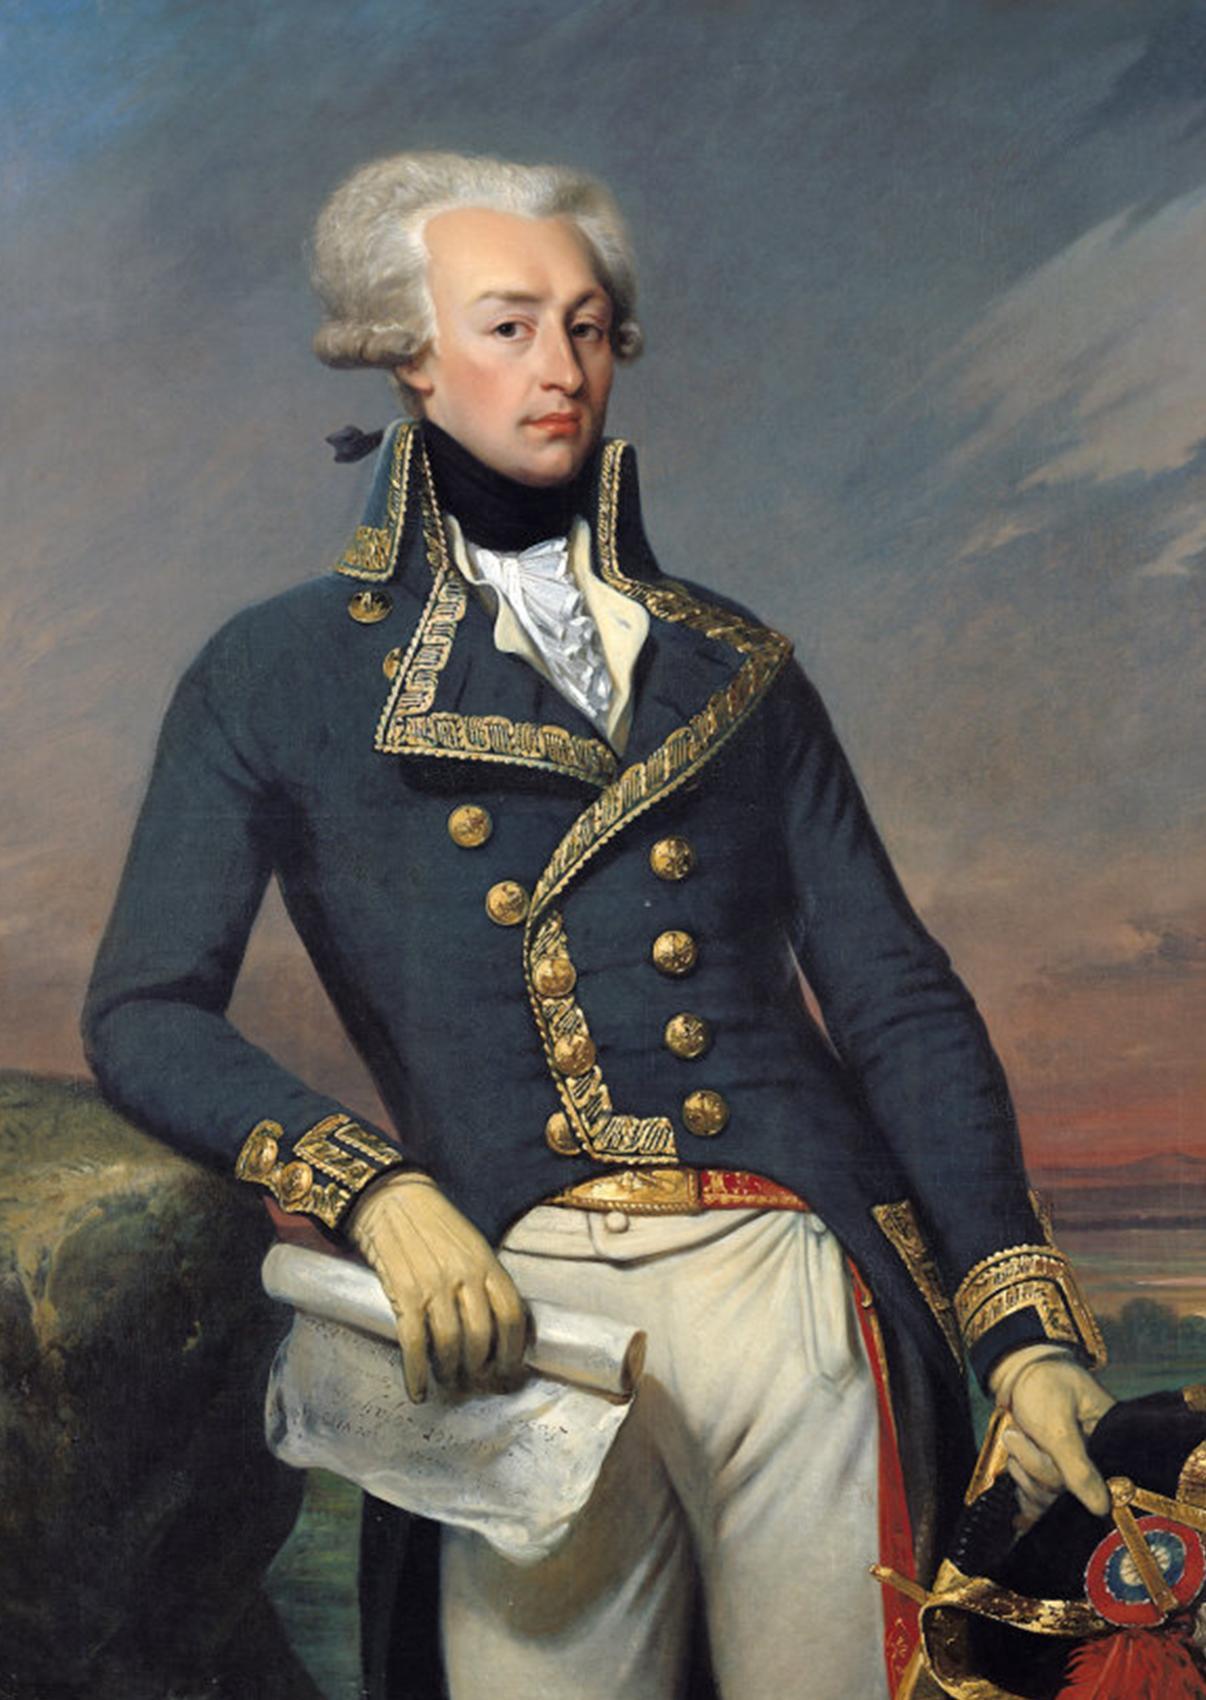 https://i0.wp.com/upload.wikimedia.org/wikipedia/commons/5/52/Gilbert_du_Motier_Marquis_de_Lafayette.jpg